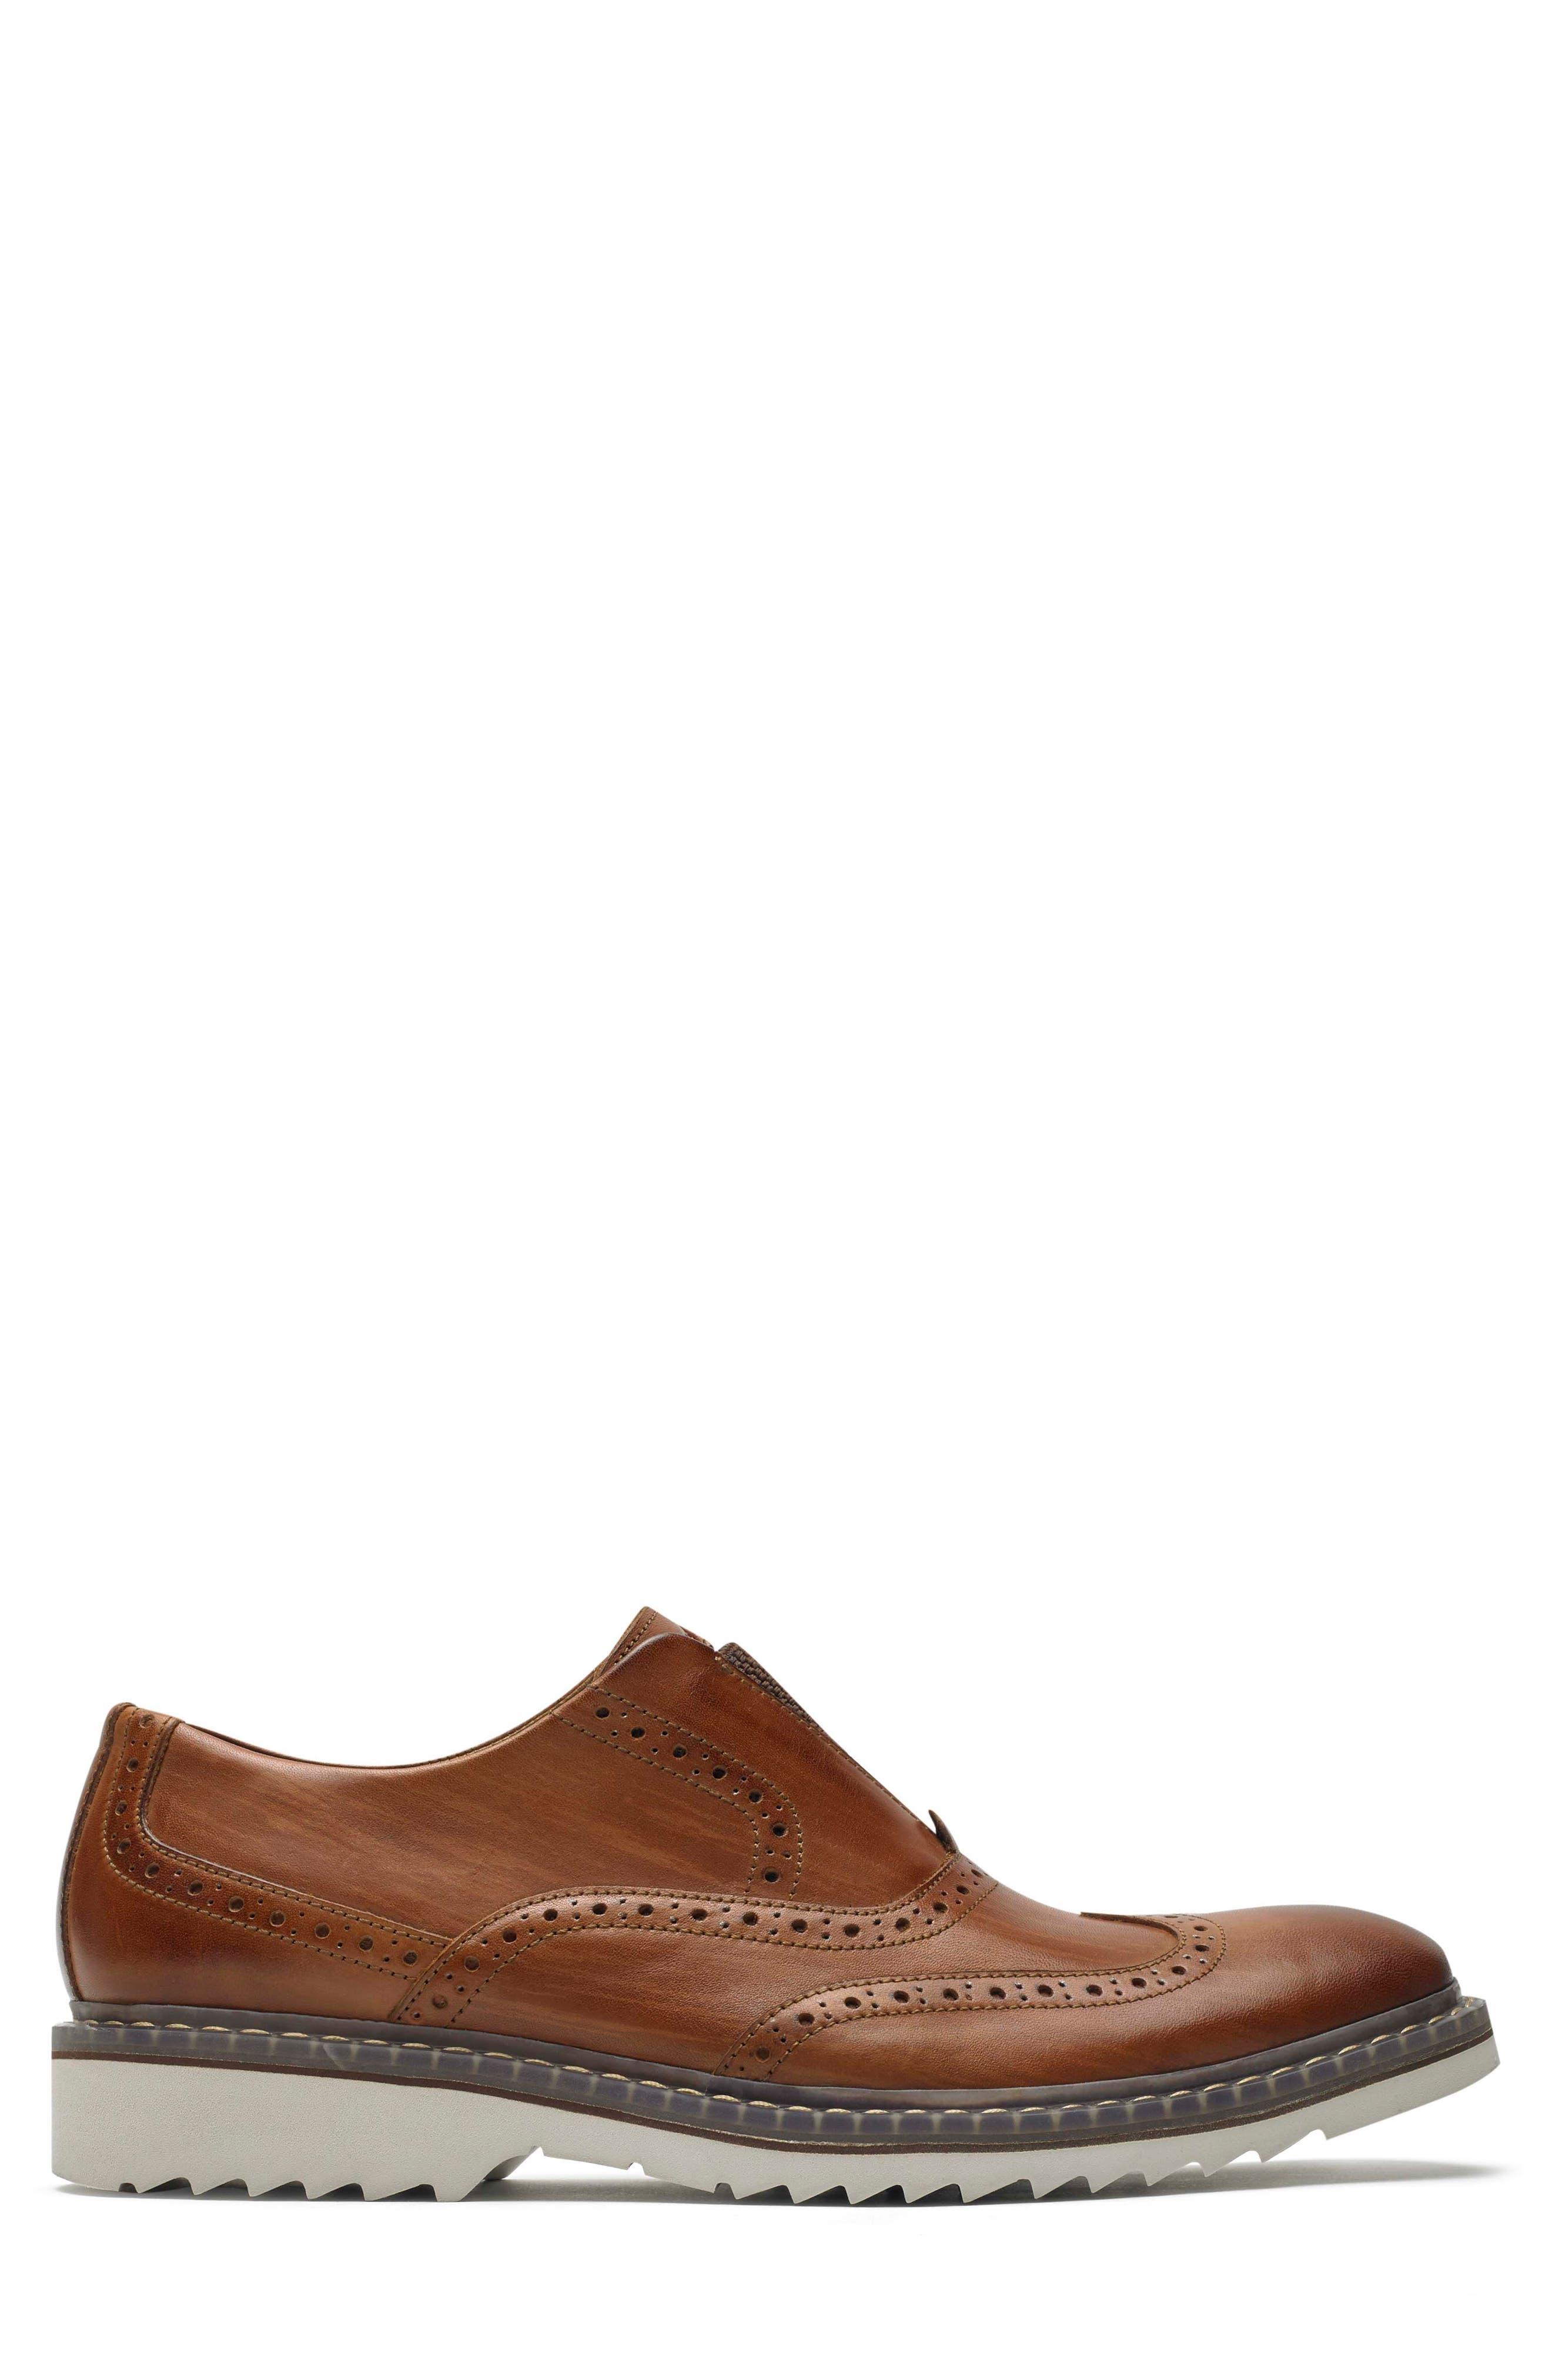 Jaxson Wingtip Slip-On,                             Alternate thumbnail 3, color,                             Tan Leather